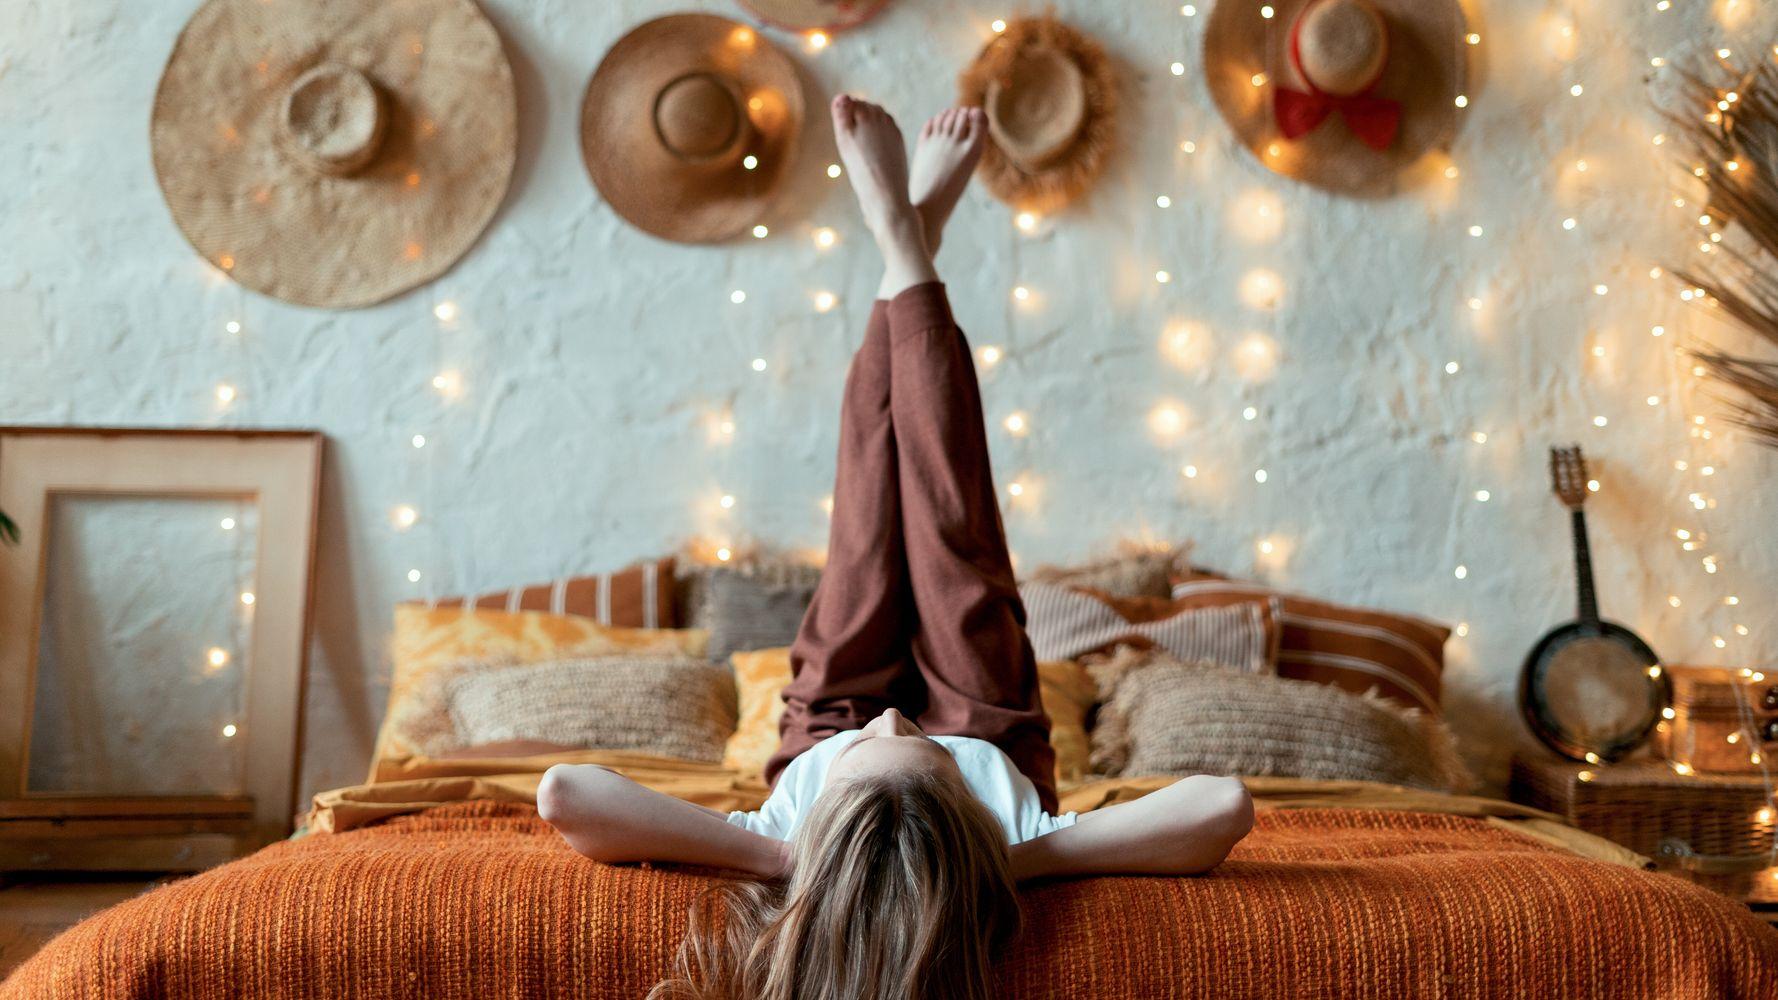 17 Alternative Self-Care Tips To Help Keep You Zen